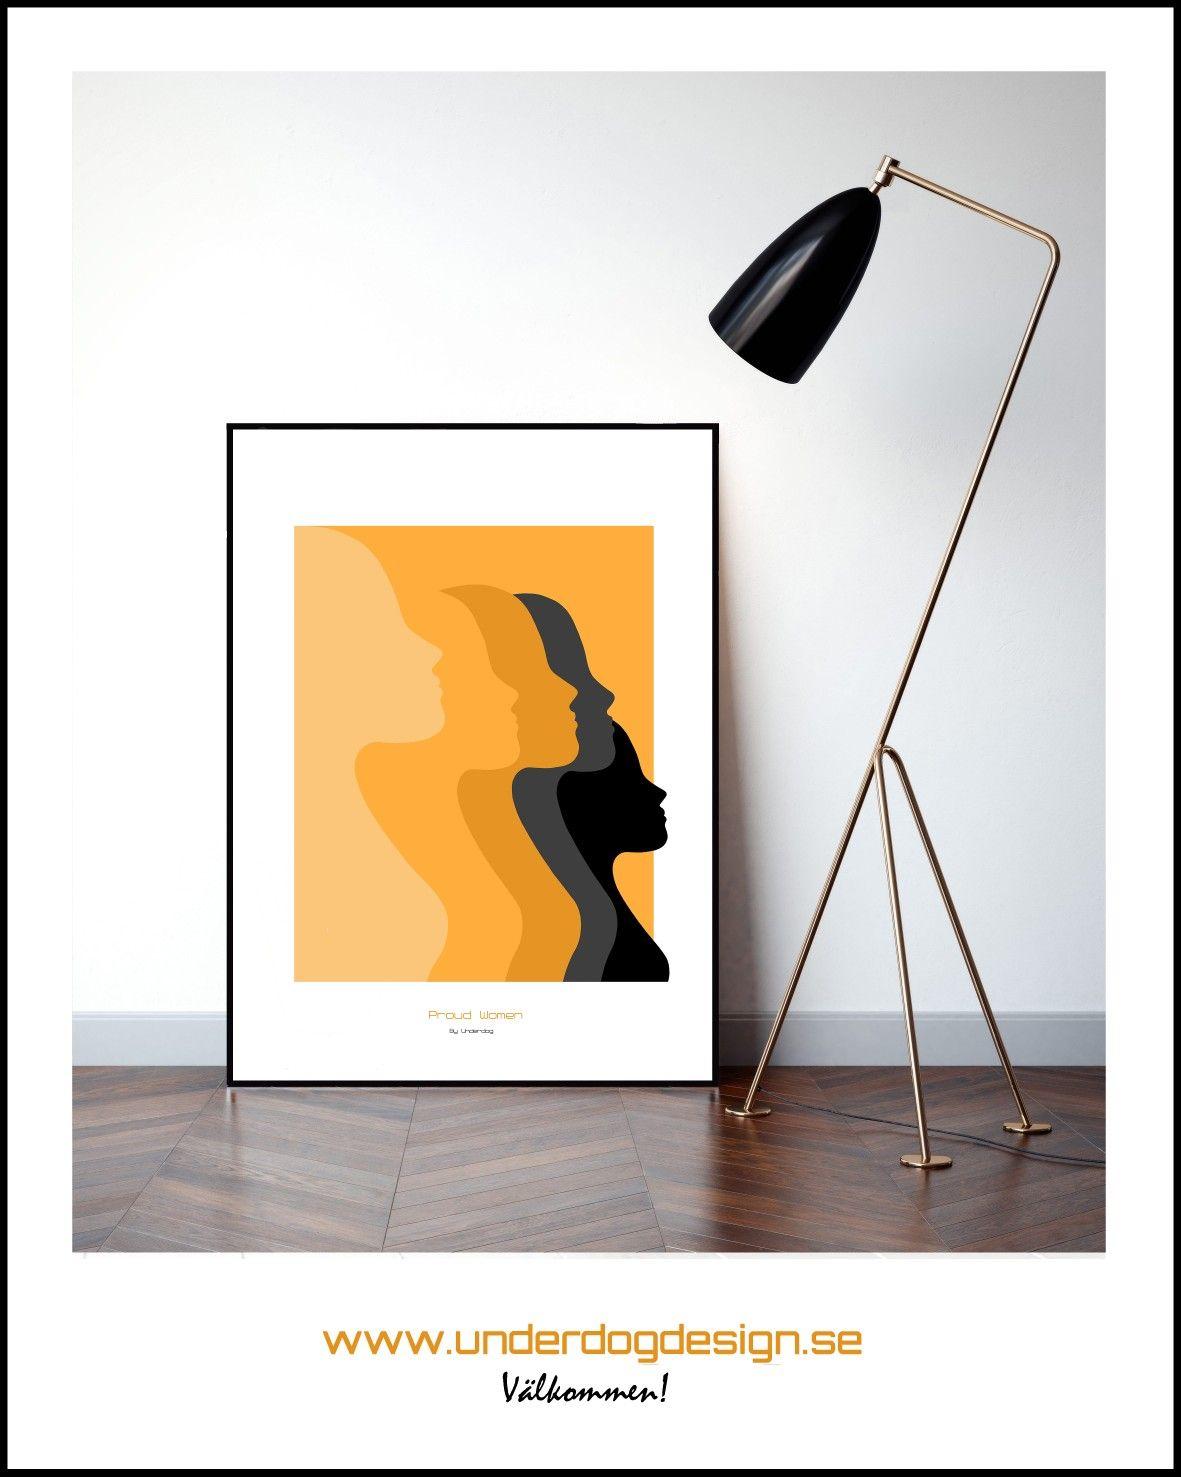 Poster, specialedition,design ,affisch